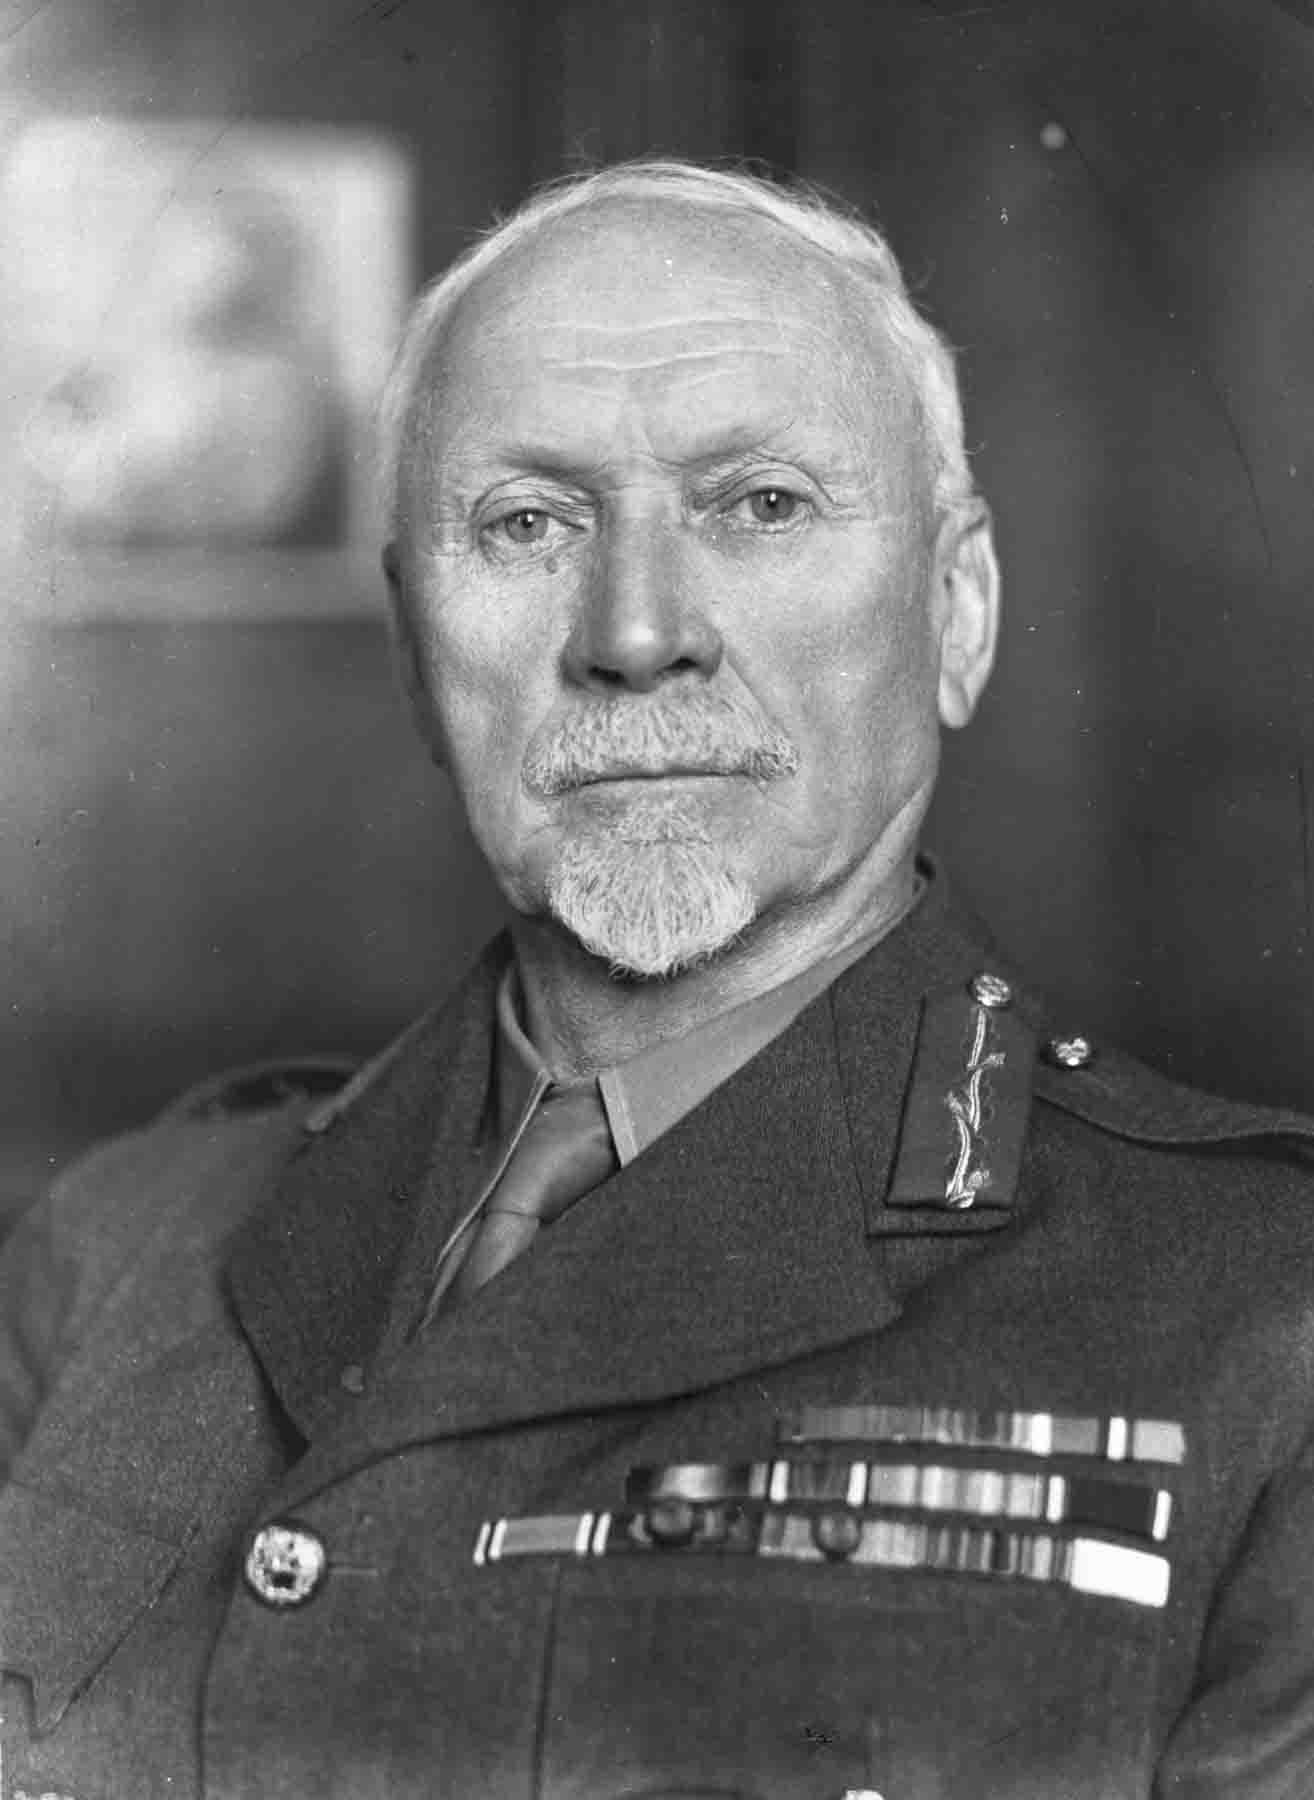 P024112 Portrait photograph of Major General Jan Smuts.